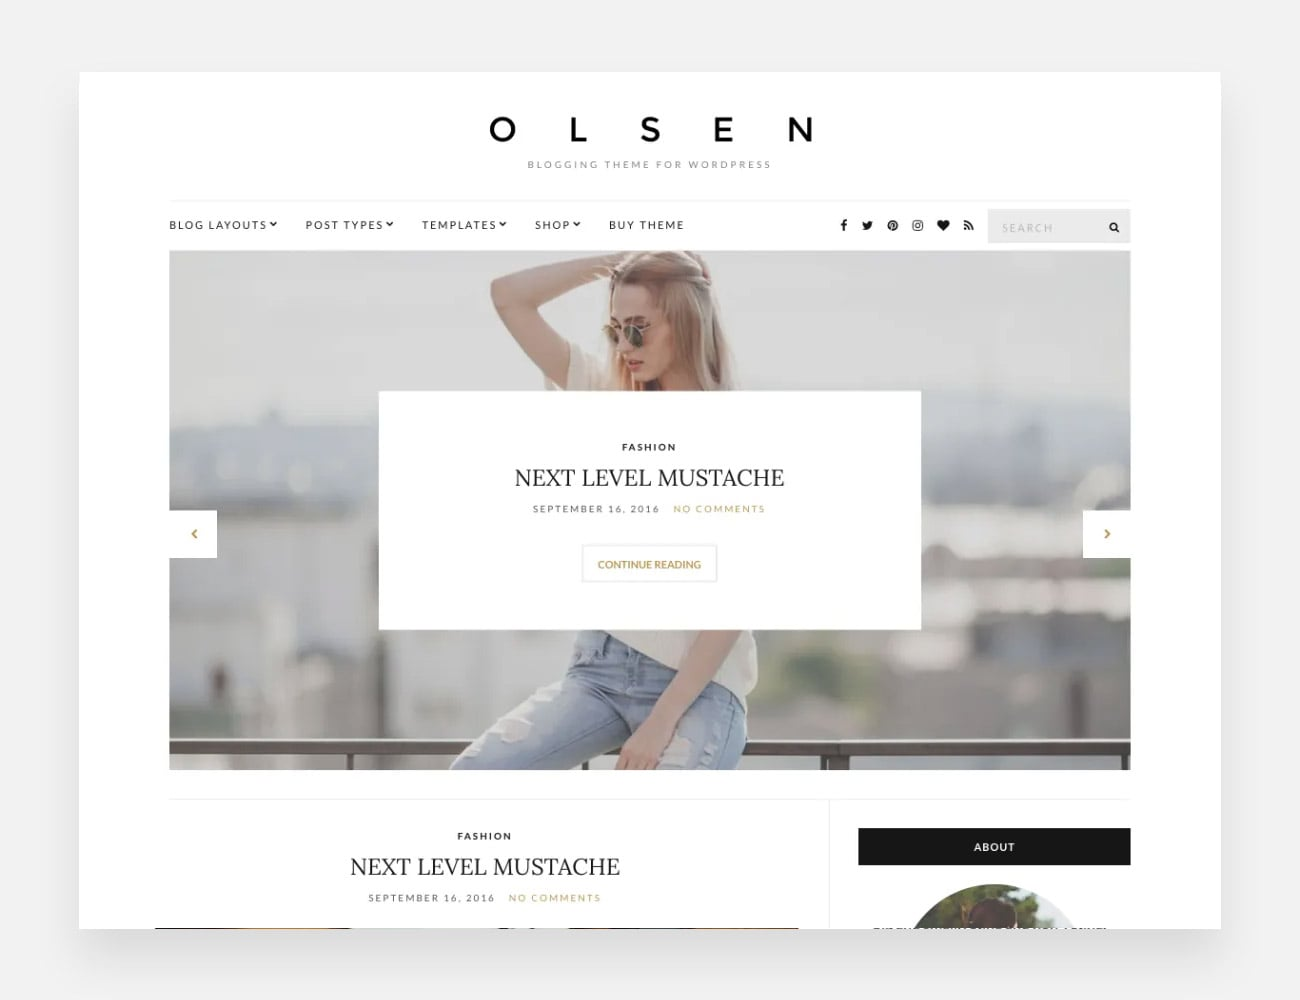 Olsen-Light Free WordPress Themes for Writers